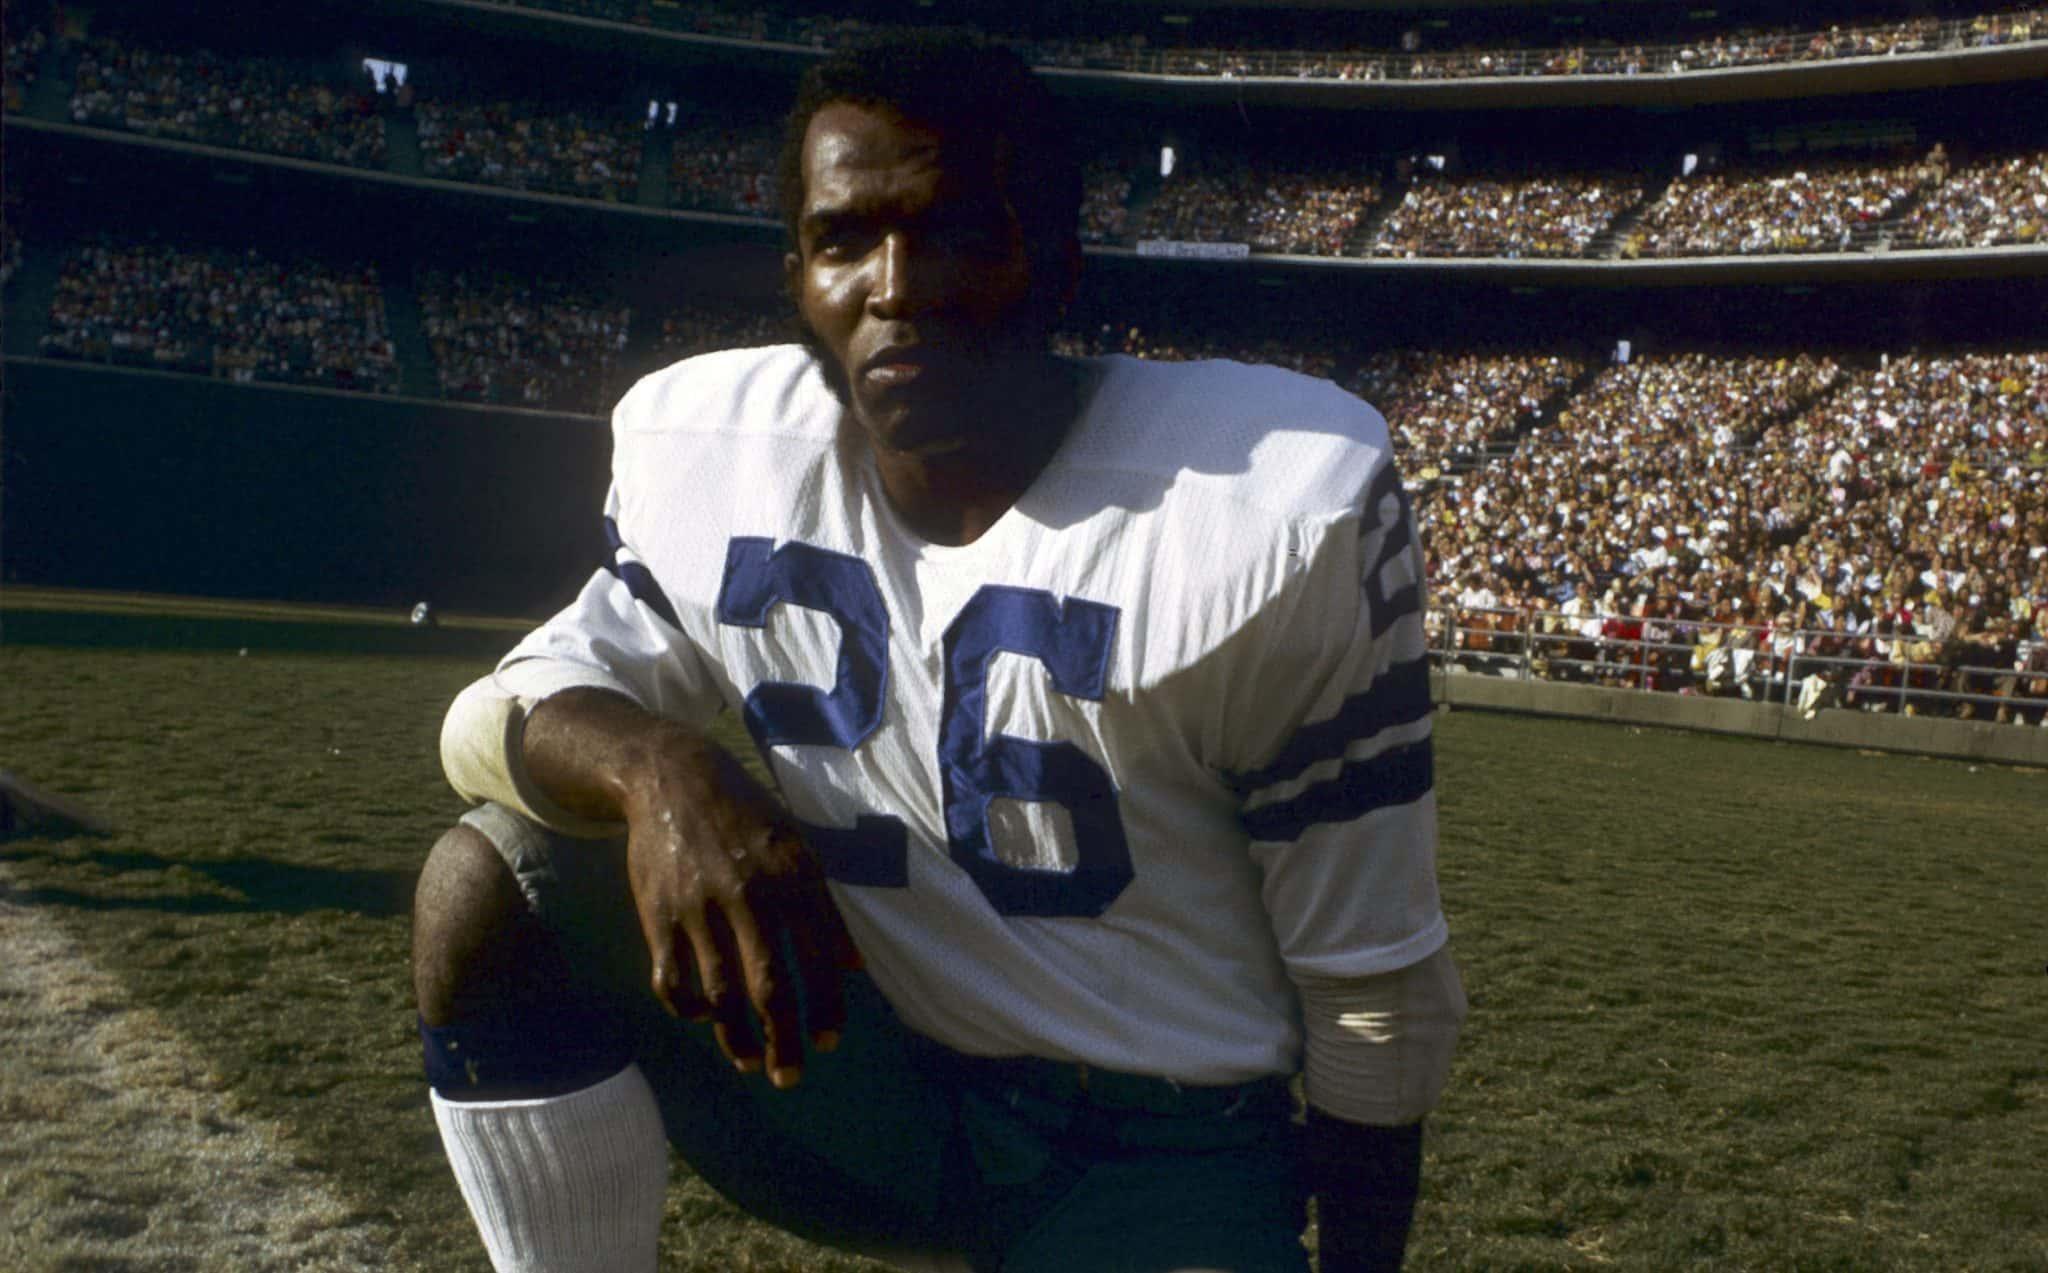 Herb Adderley — Michigan State (Big Ten) (1958-1960)